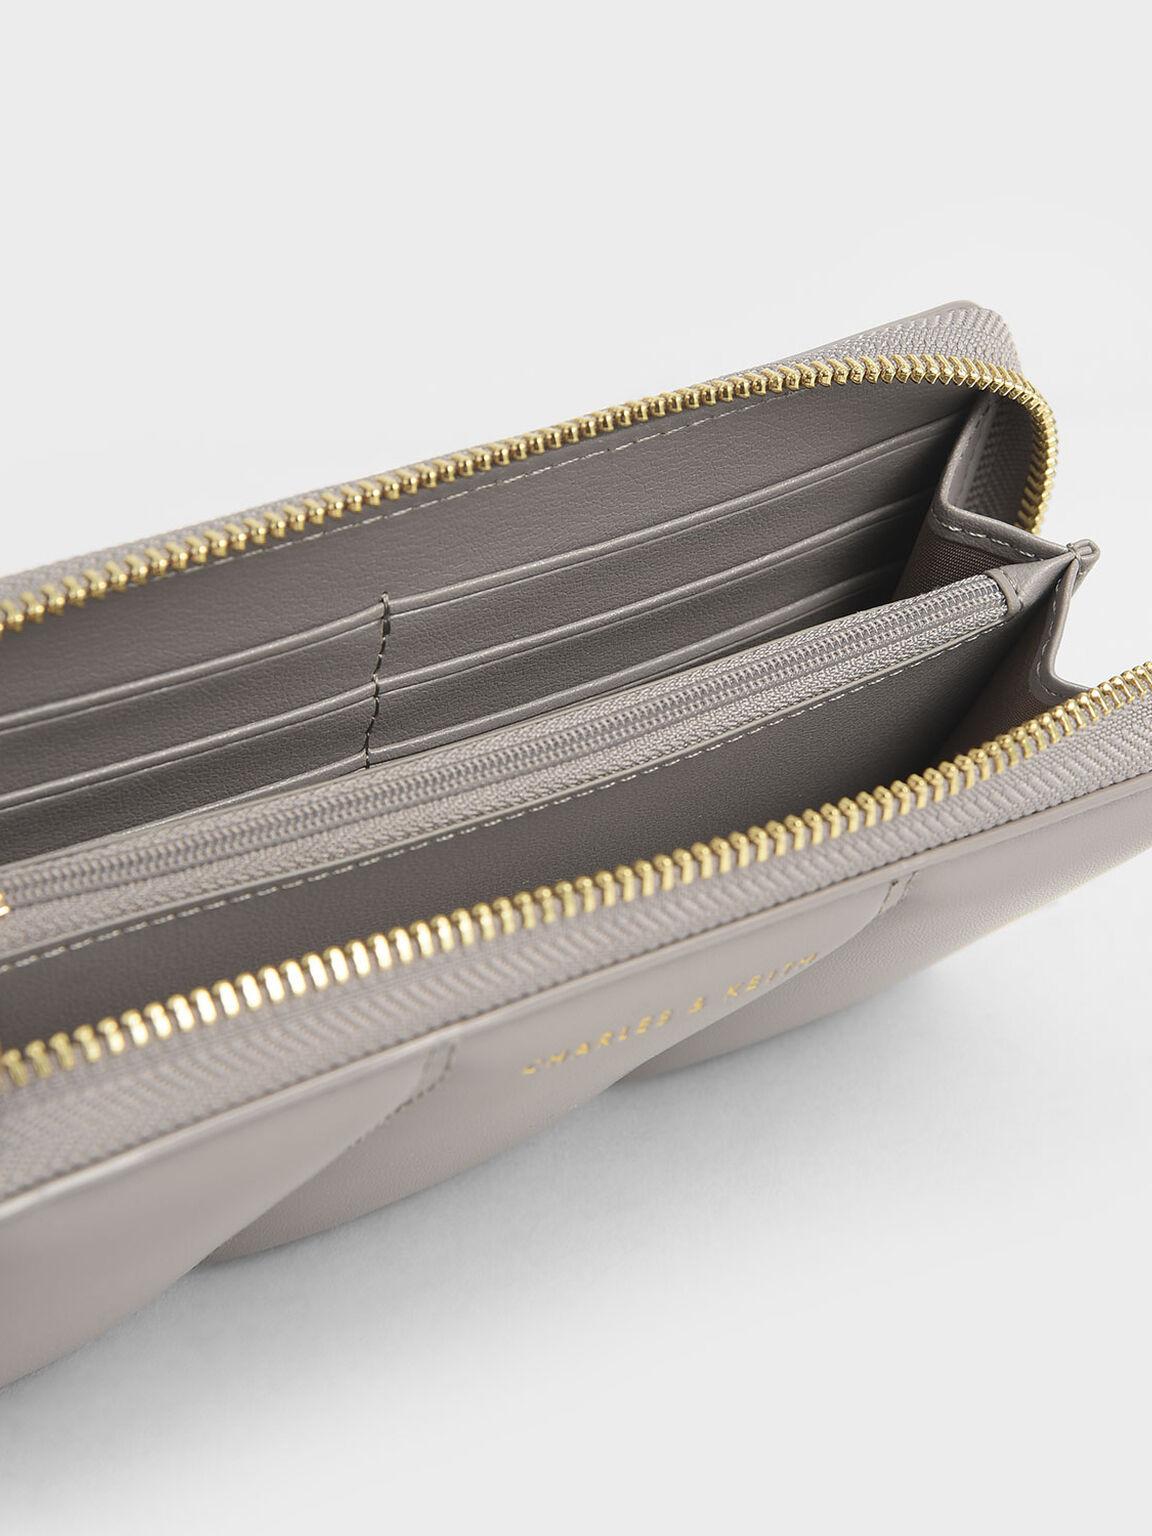 Mini Zip Around Quilted Tassel Wallet, Sand, hi-res